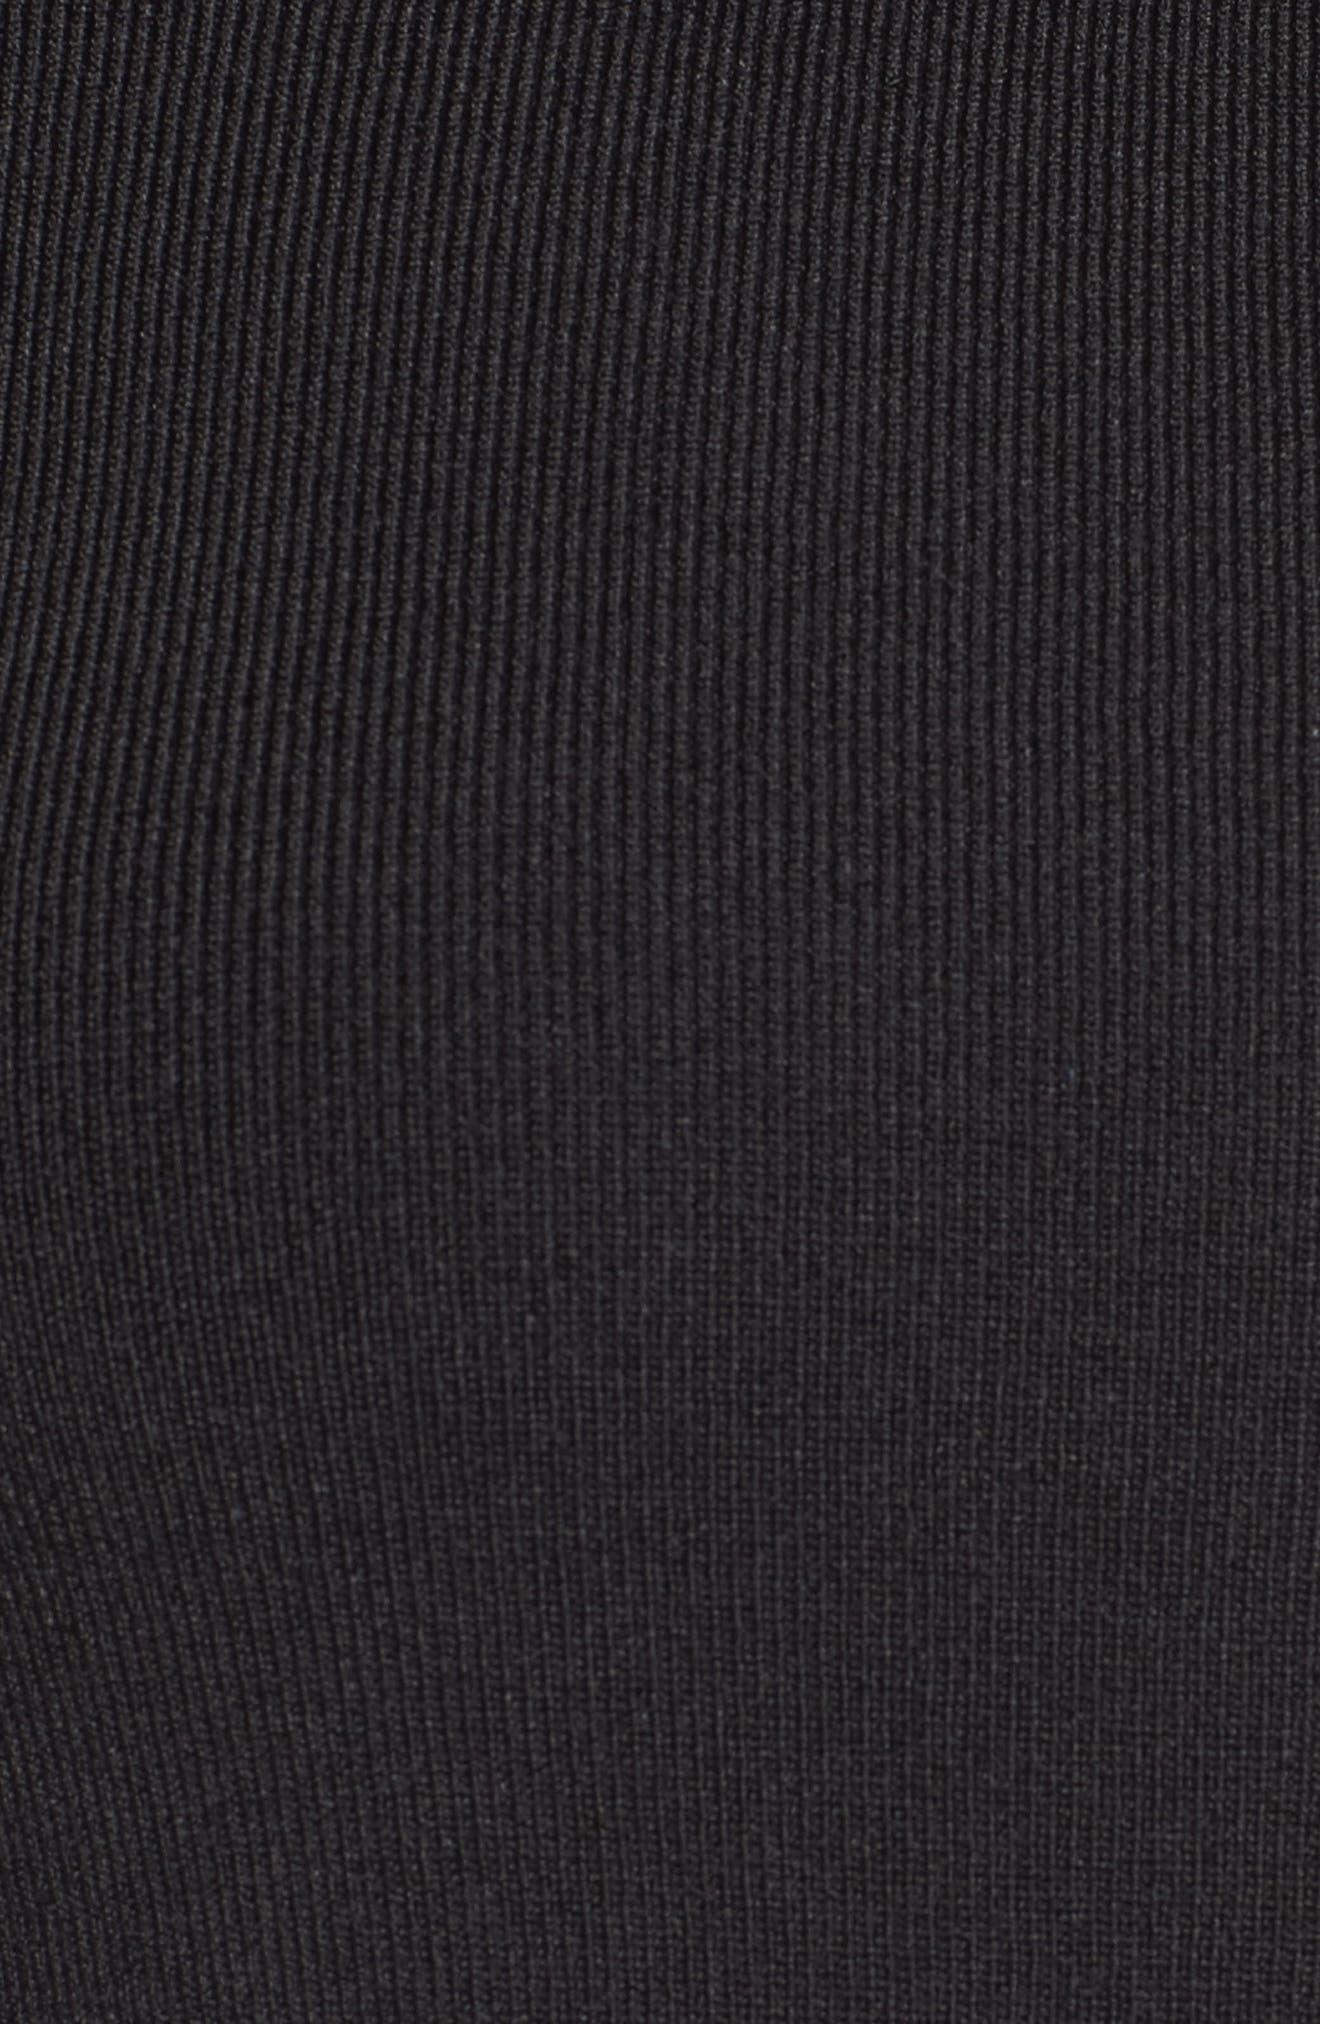 One-Shoulder Midi Dress,                             Alternate thumbnail 5, color,                             004